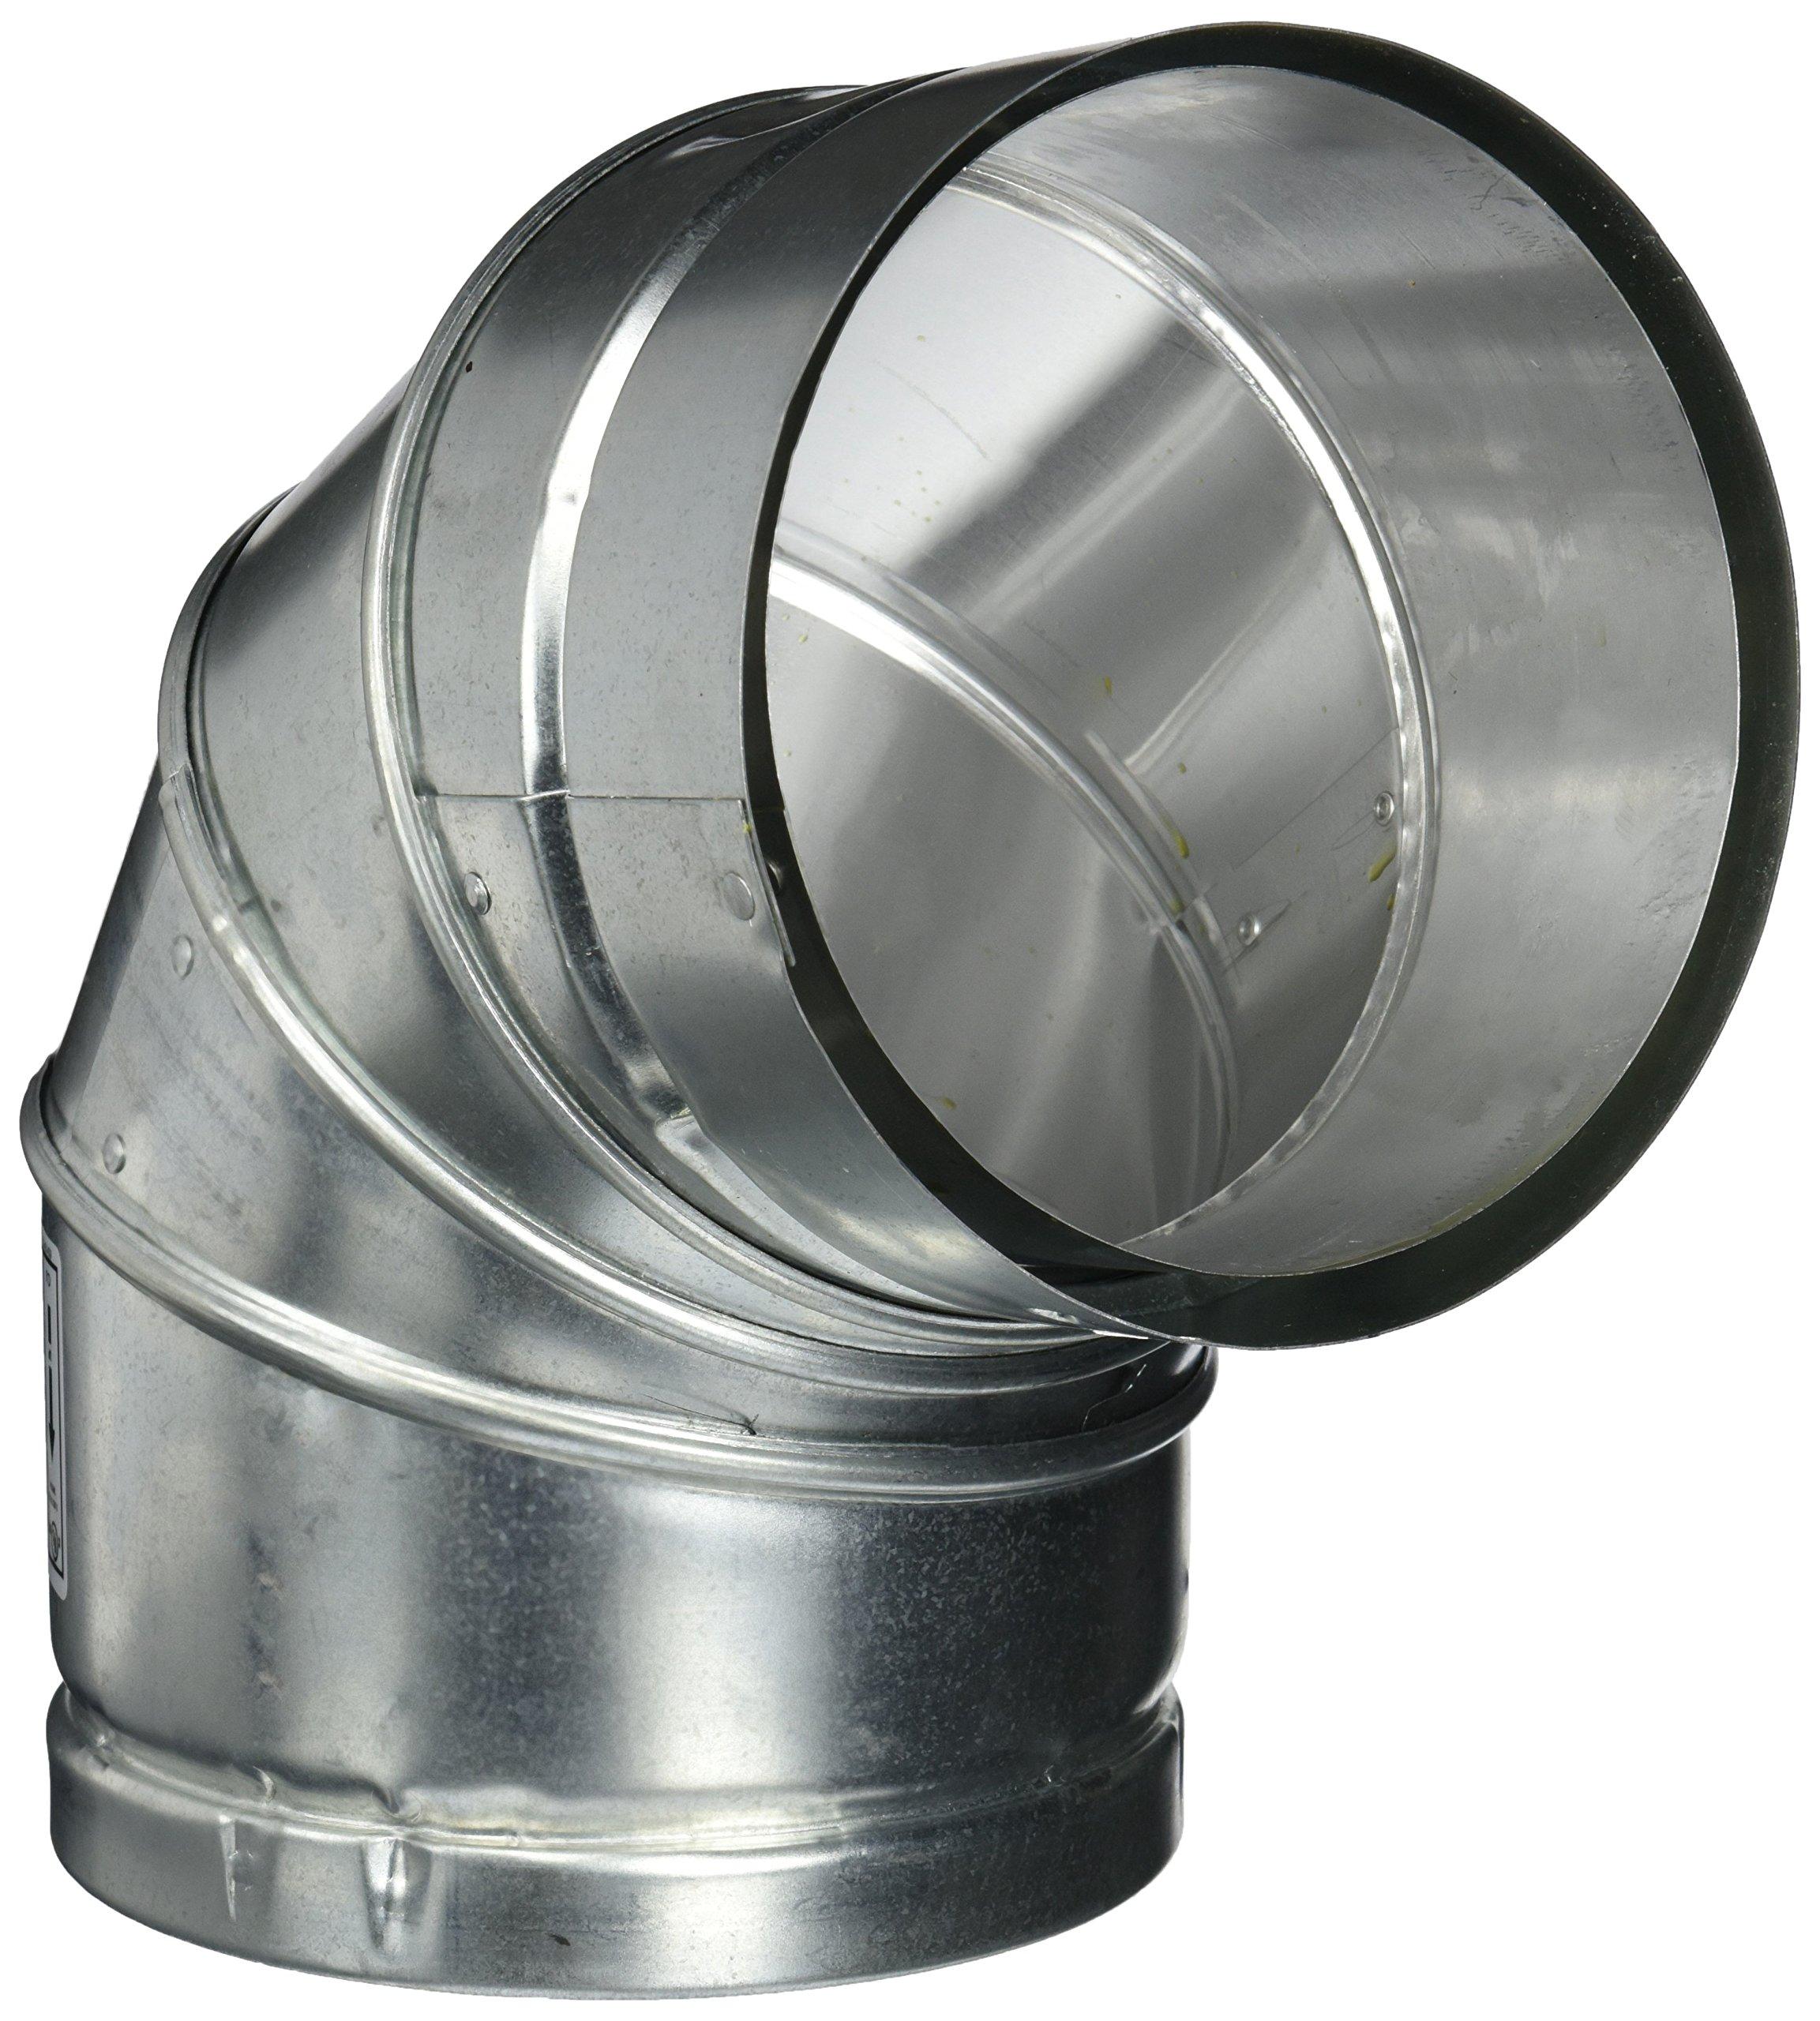 SELKIRK CORP 106230 Adjustable 90DEG Elbow, 6-Inch